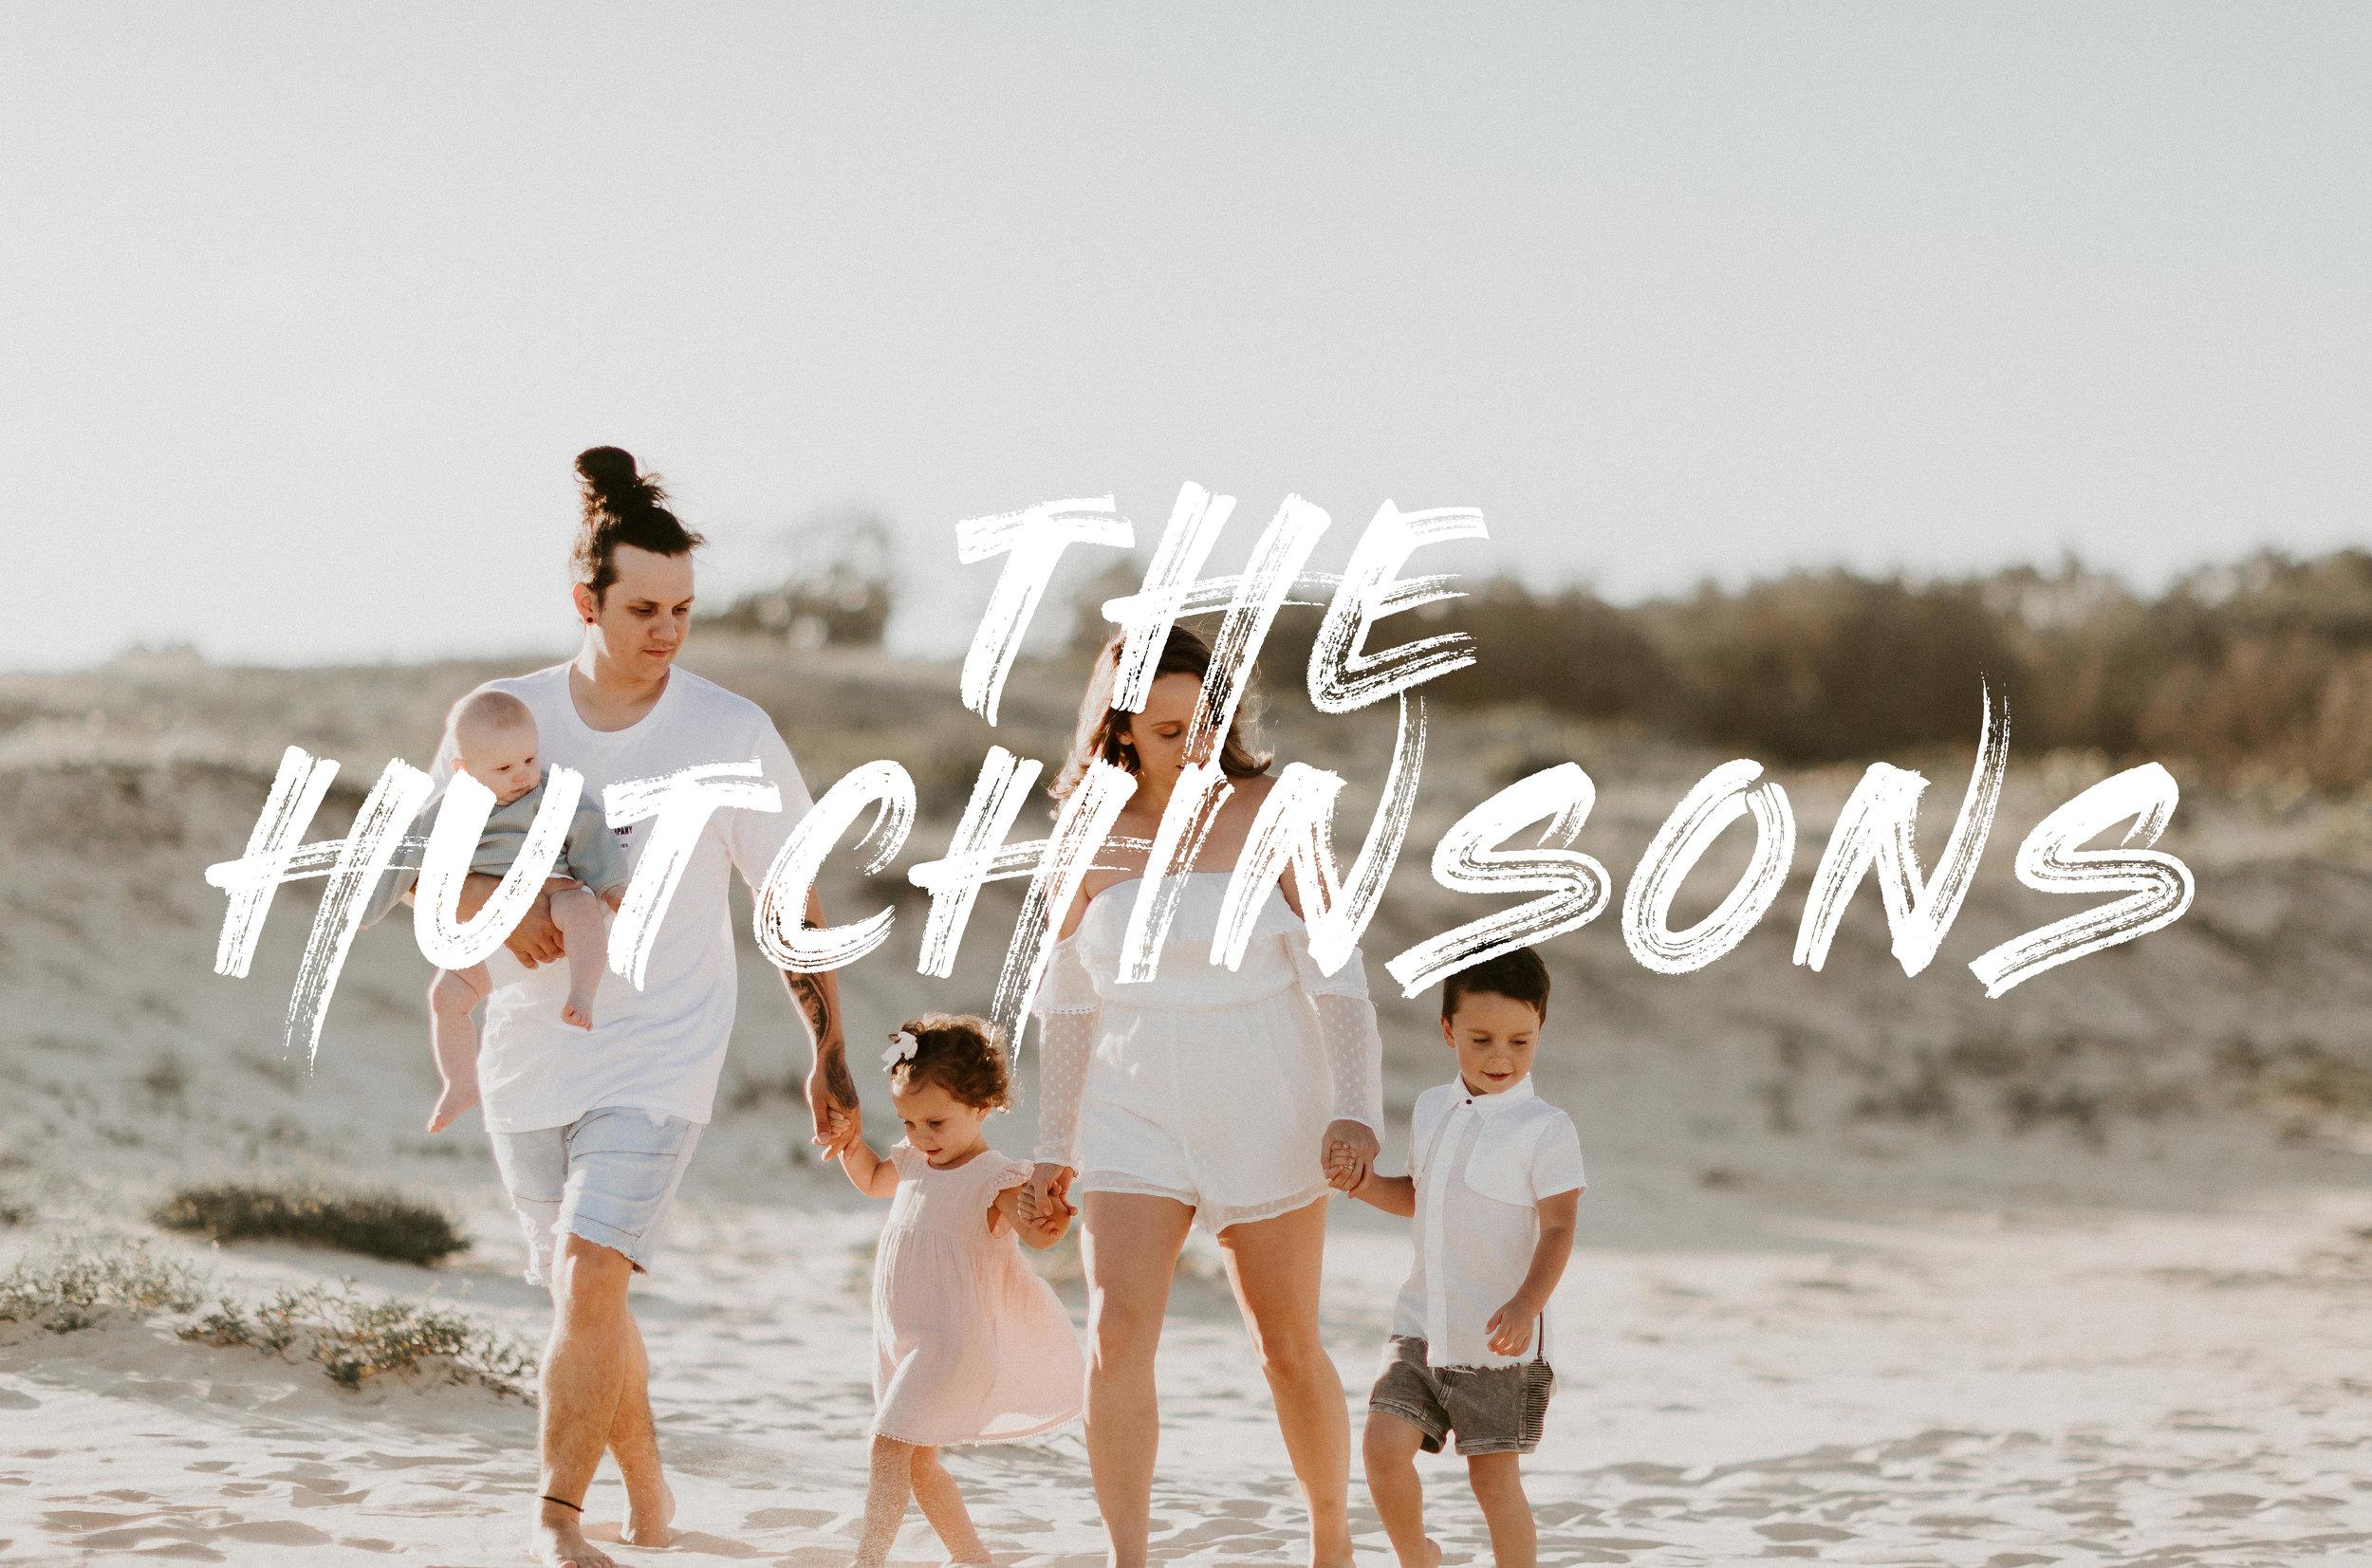 TheHutchinsonsThumbnail.jpg